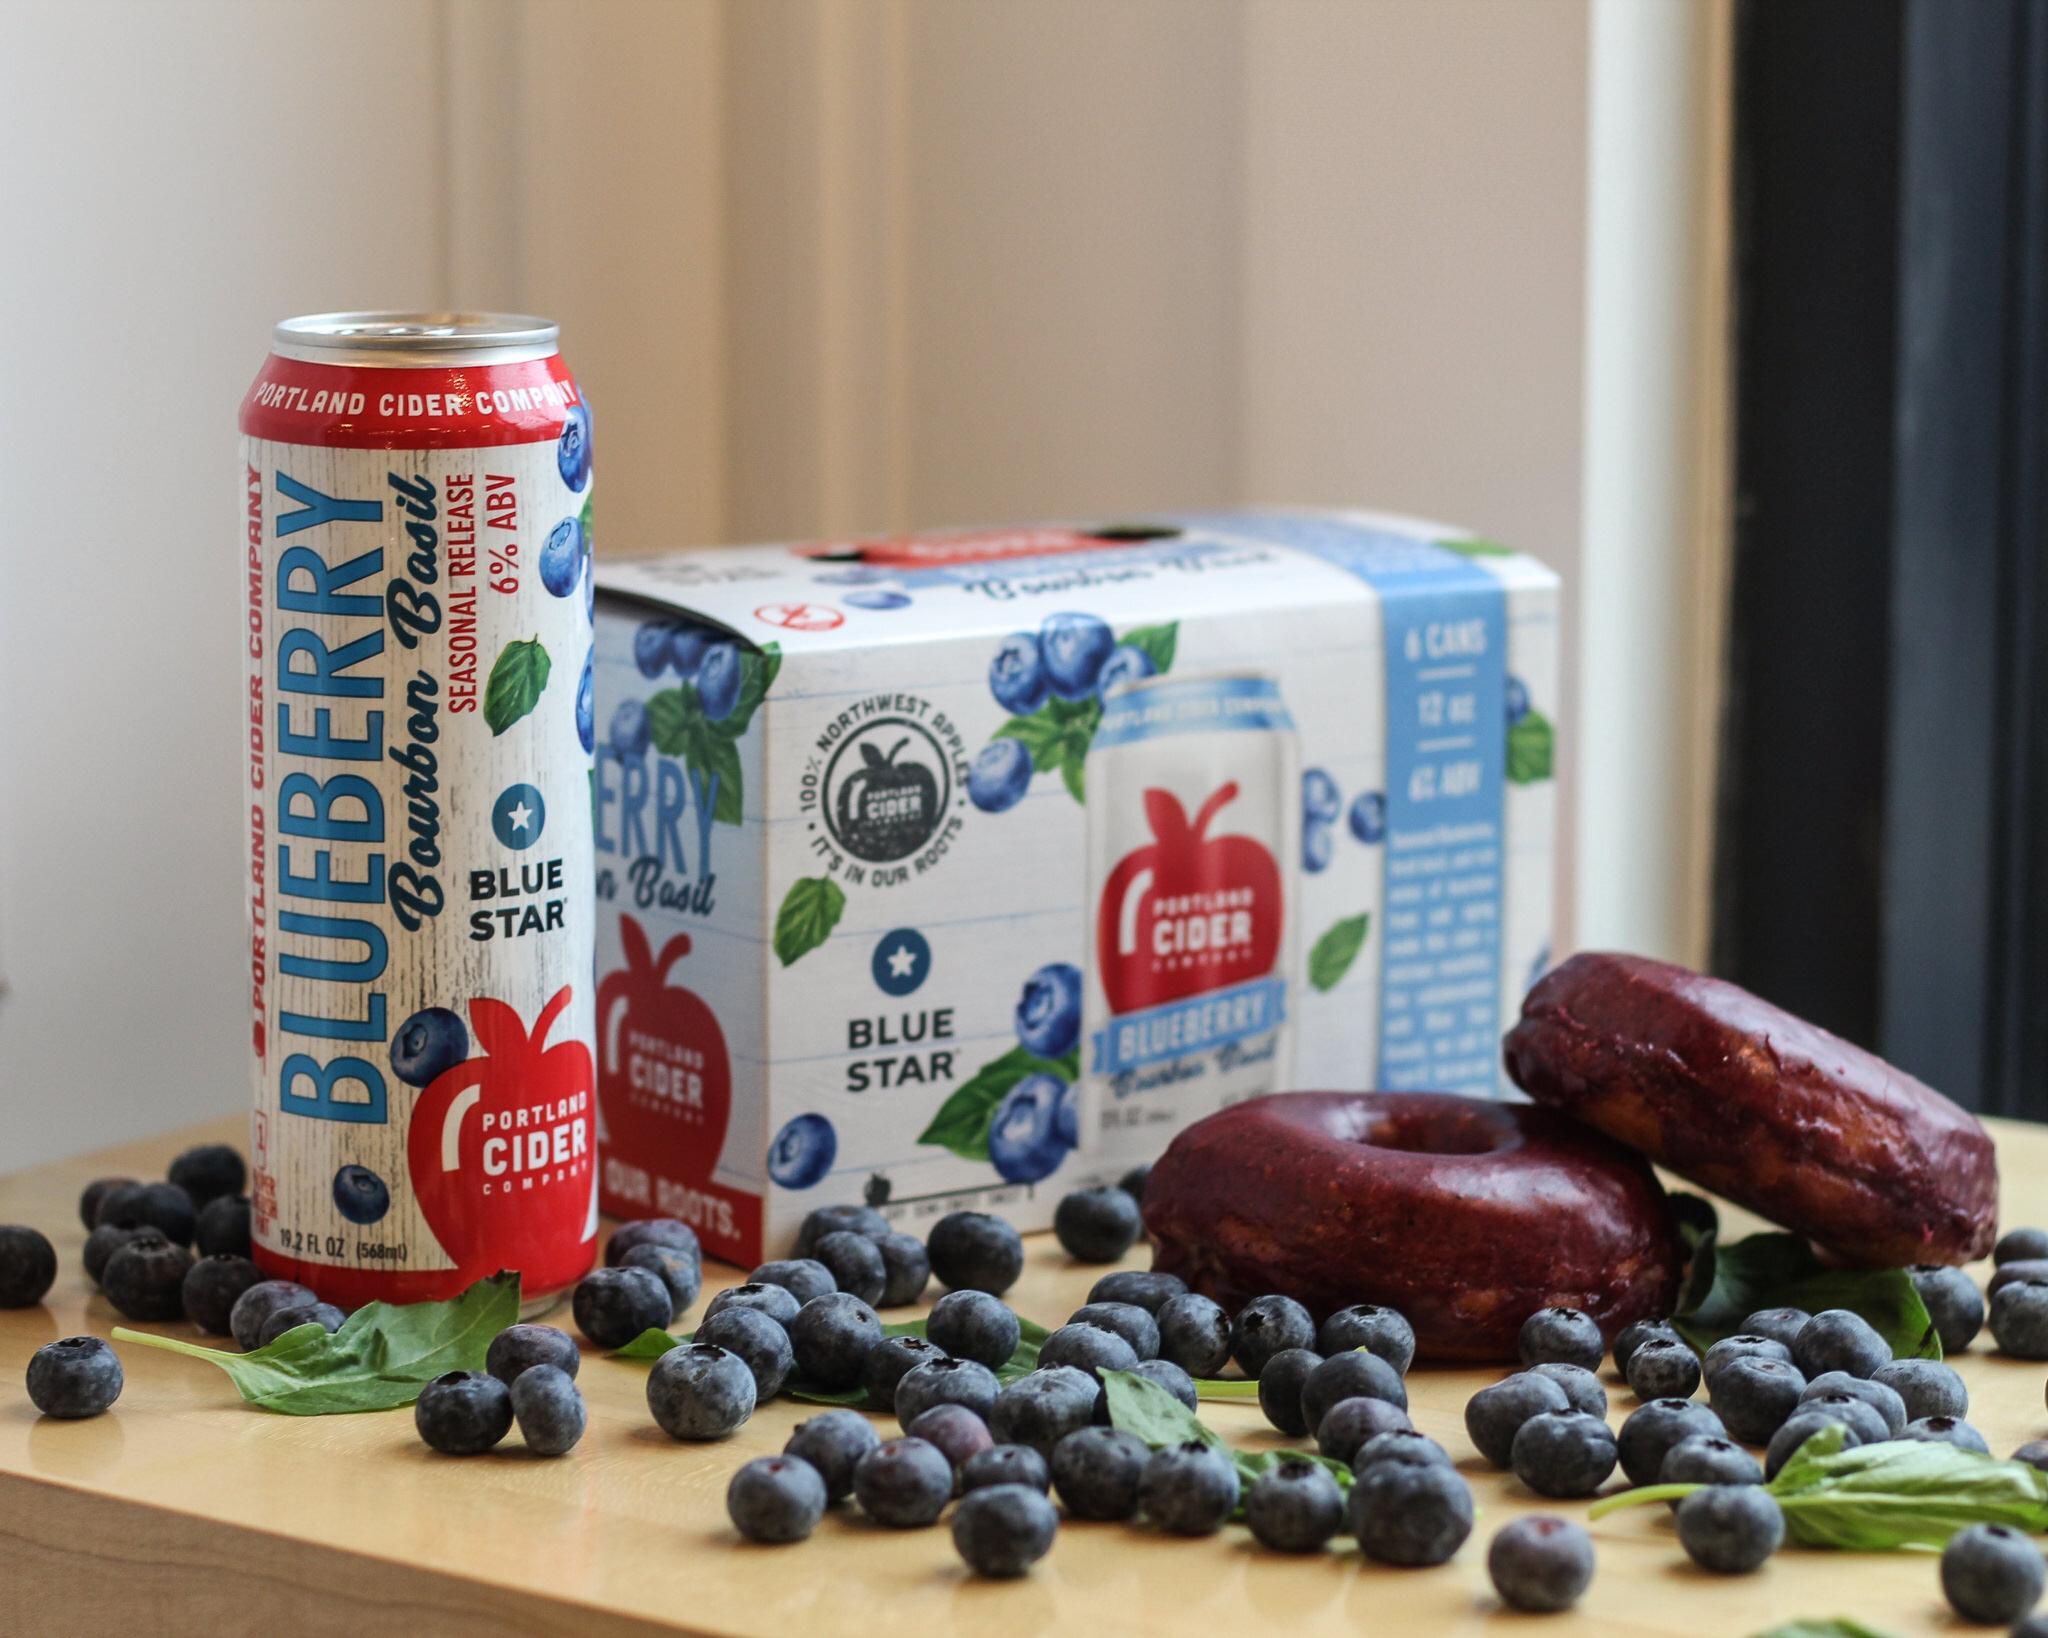 image of Blueberry Bourbon Basil courtesy of Portland Cider Co.